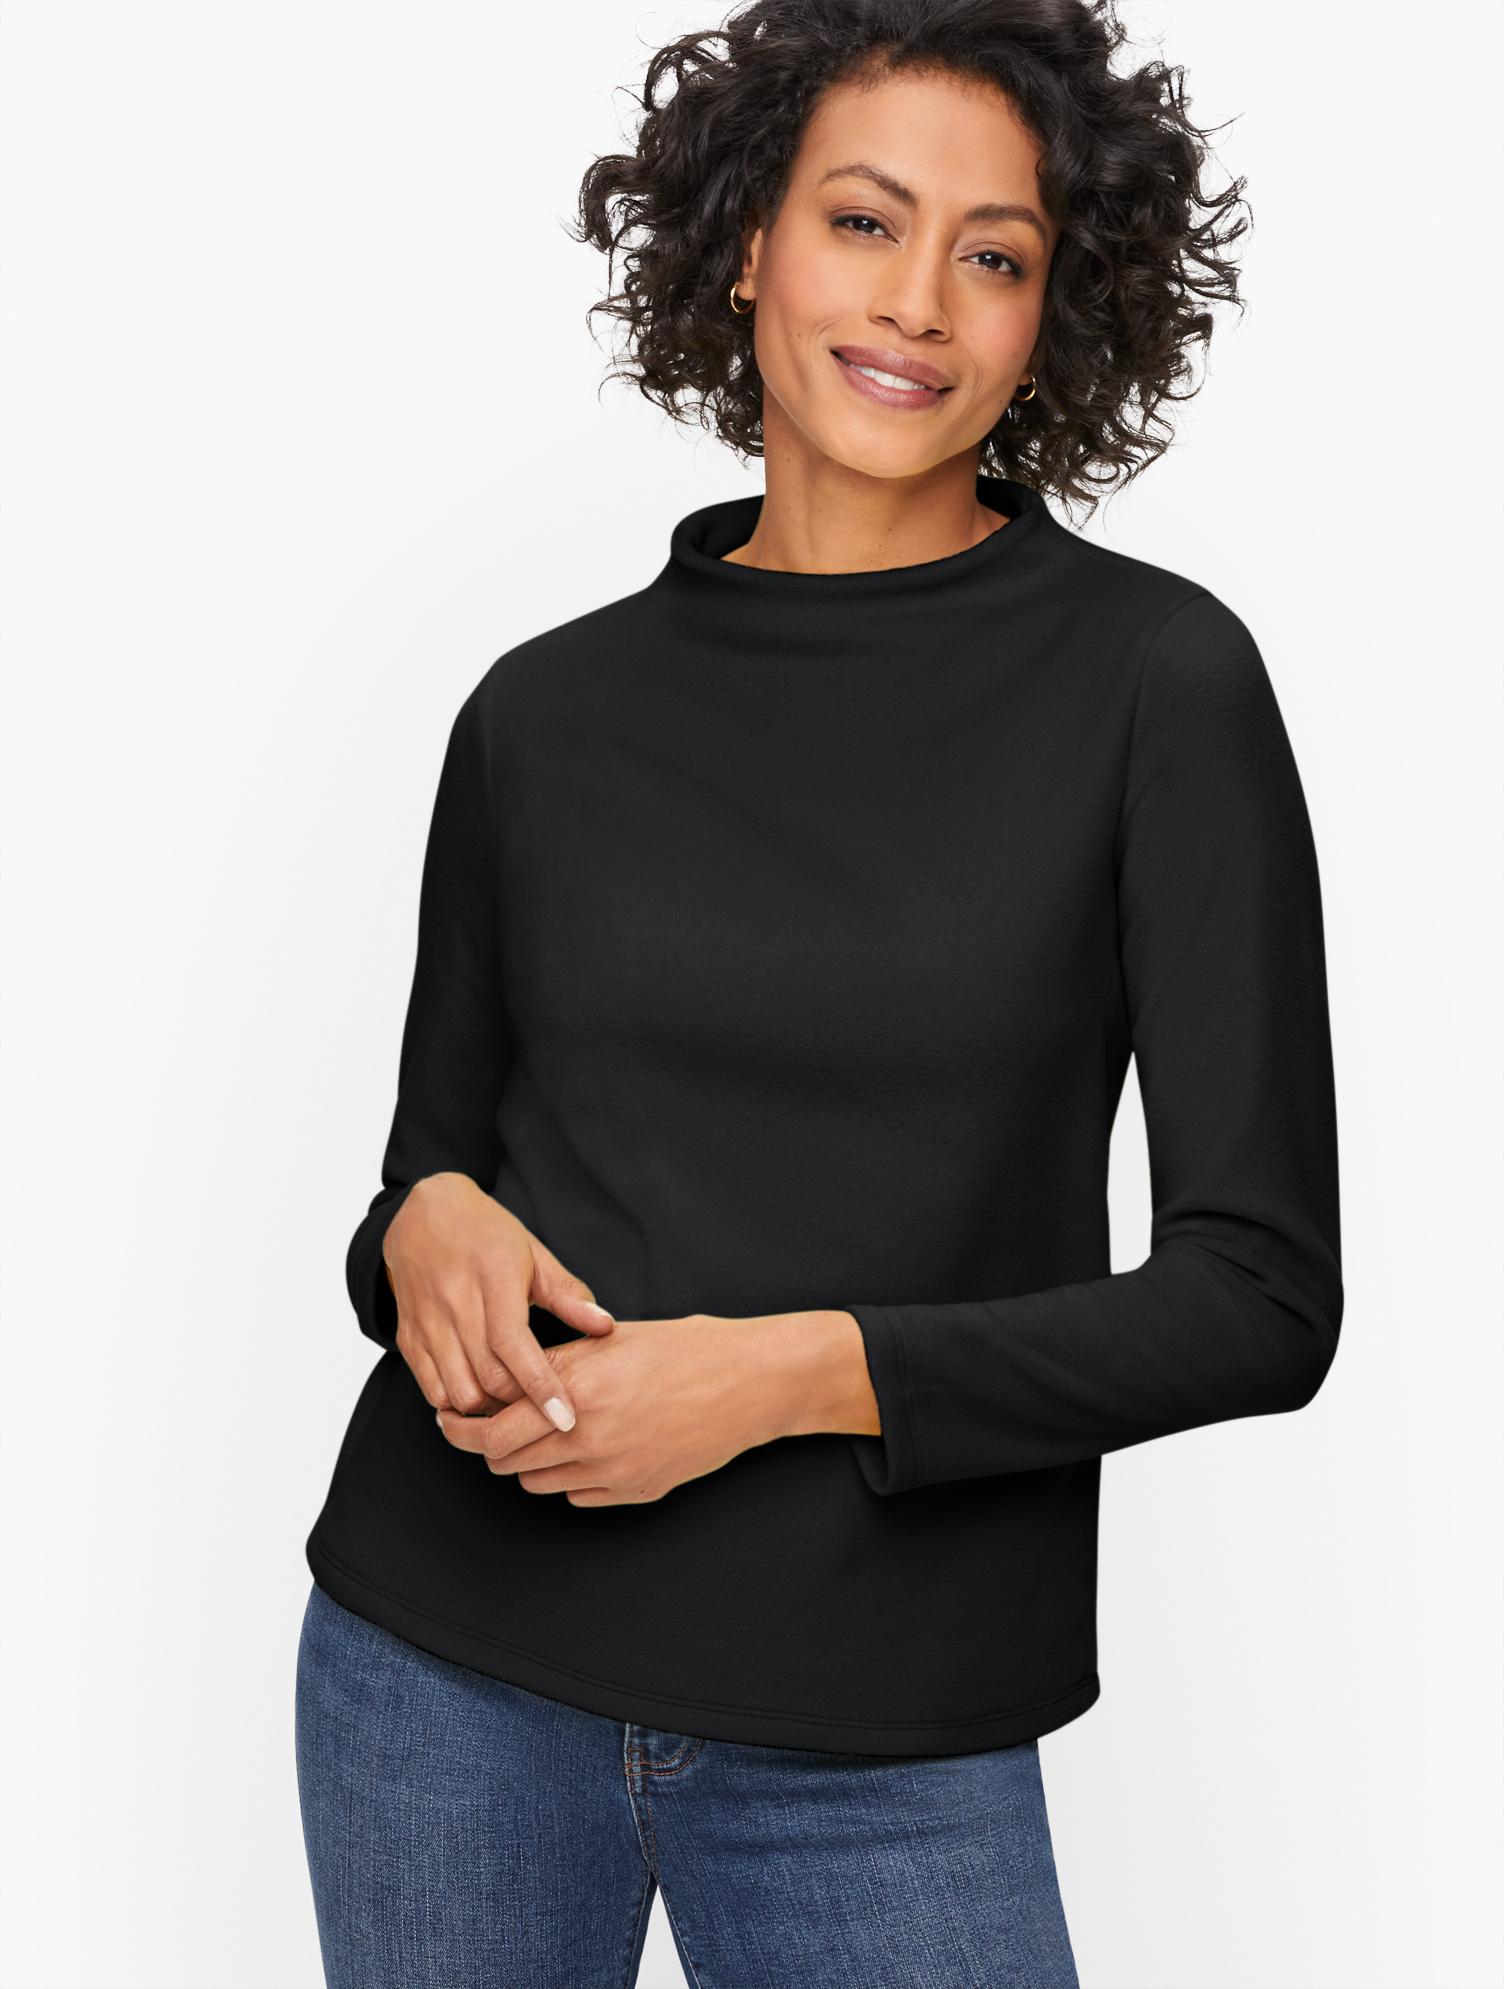 60s Shirts, T-shirts, Blouses, Hippie Shirts Microfleece Funnel Neck Top - Black - 3X Talbots $69.50 AT vintagedancer.com